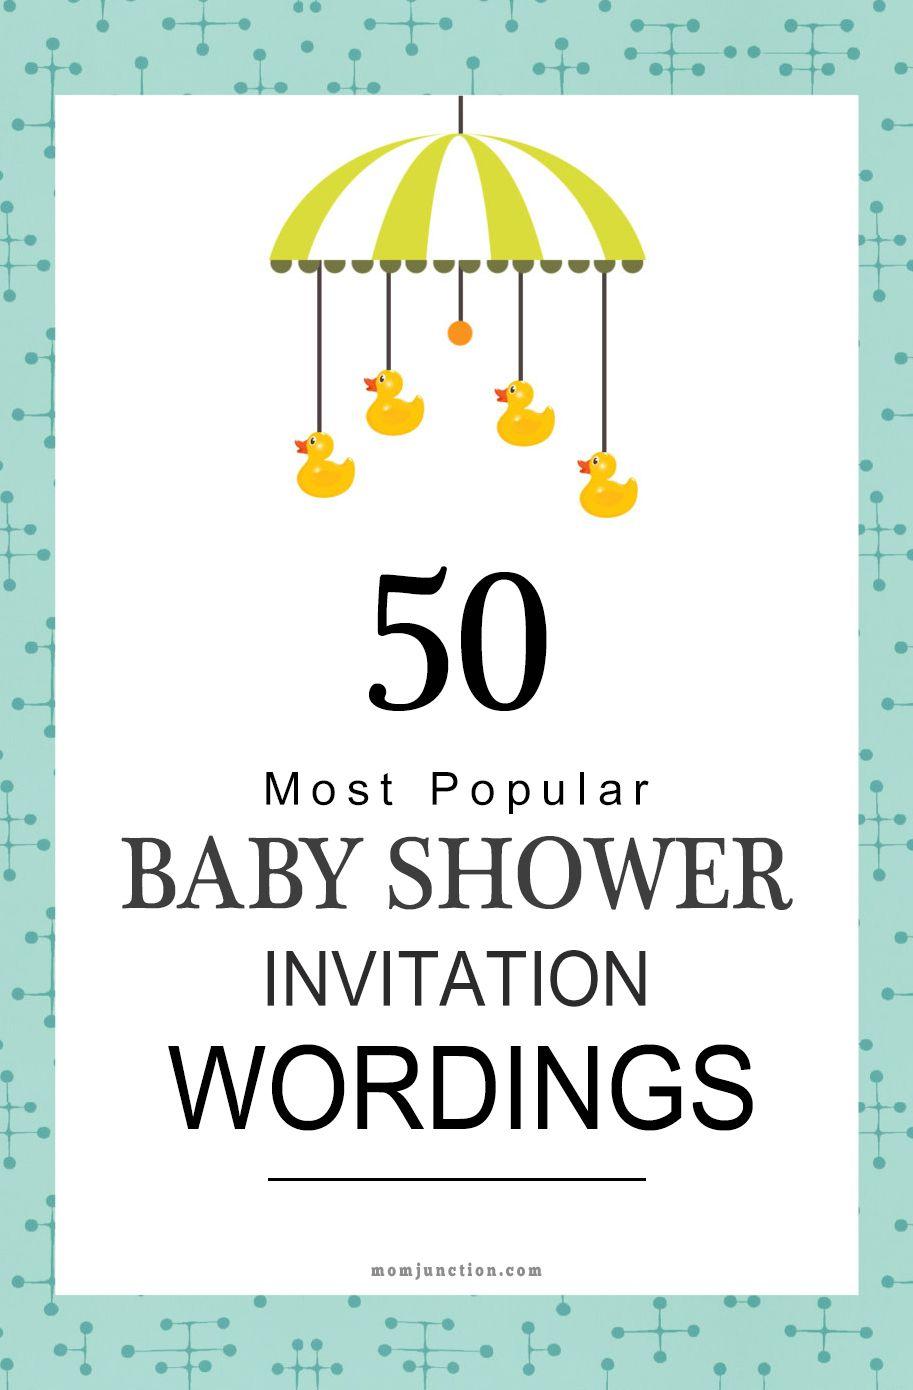 125 Baby Shower Invitation Wording Ideas Baby Shower Invitation Wording Baby Shower Invitation Message Sample Baby Shower Invitations